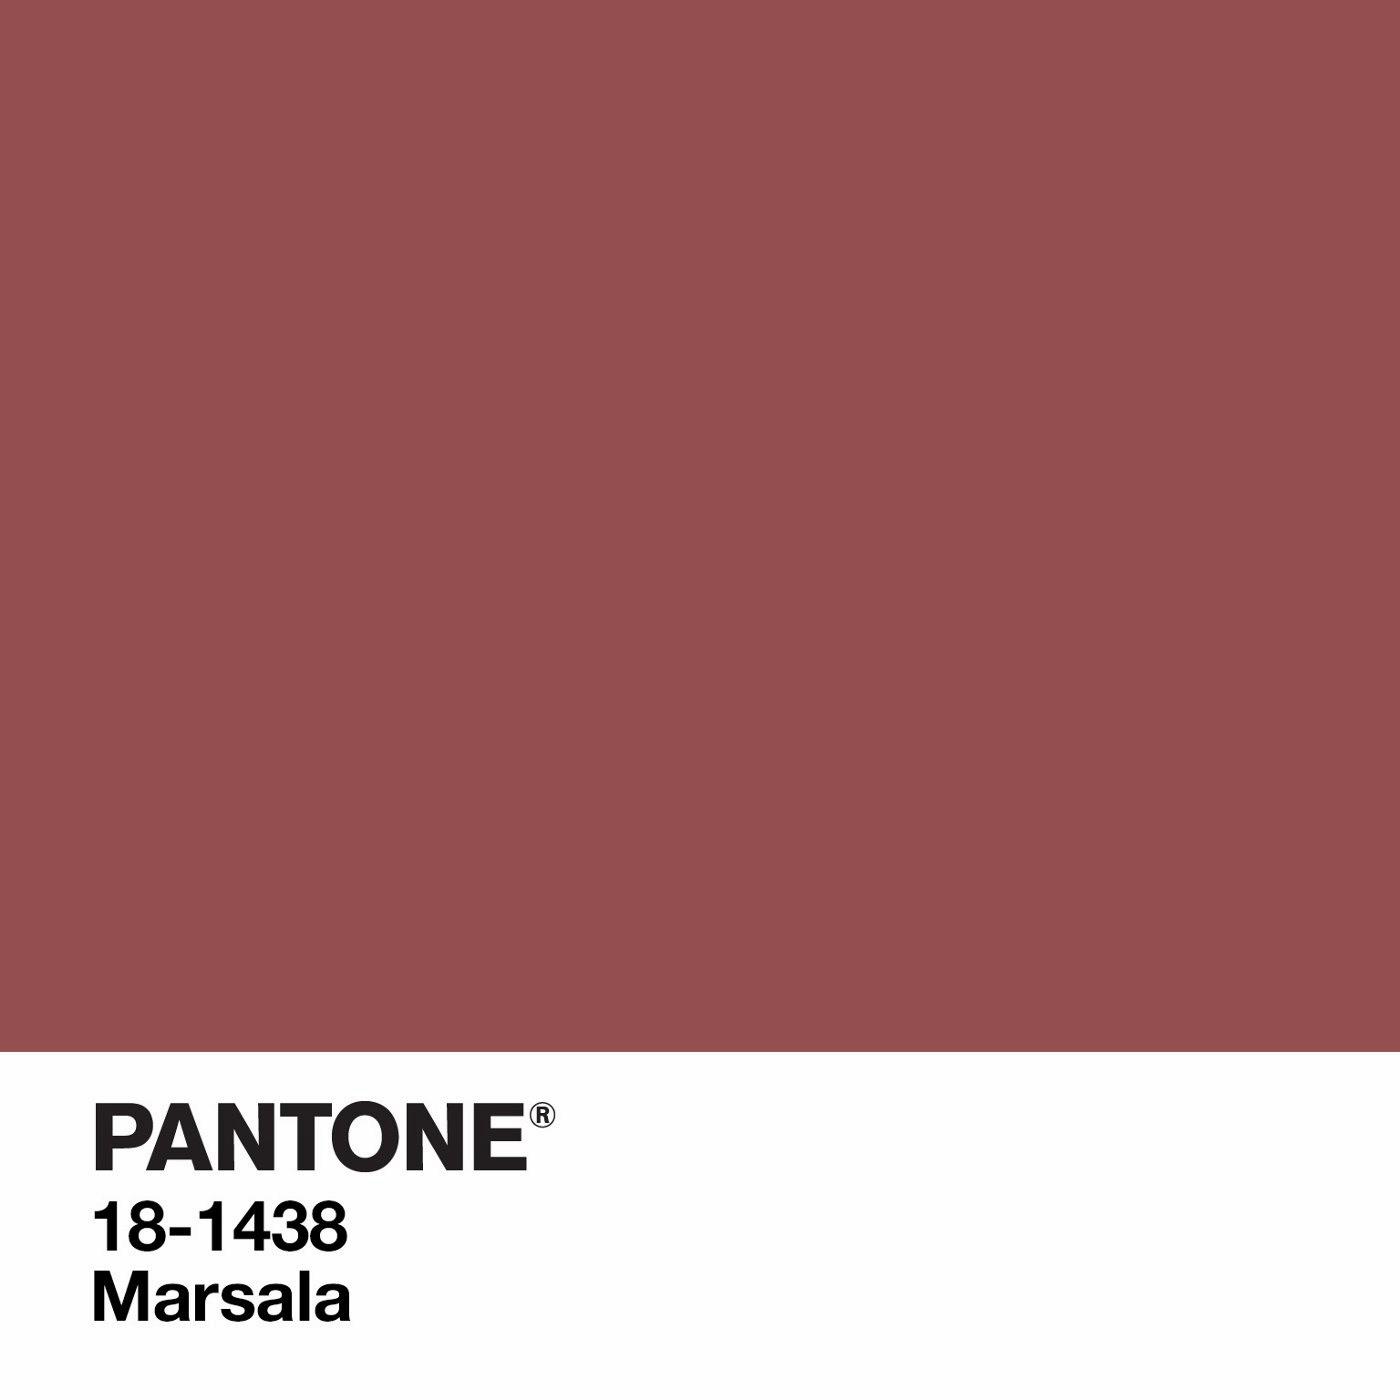 foto: marsala pantone color of the year 2015